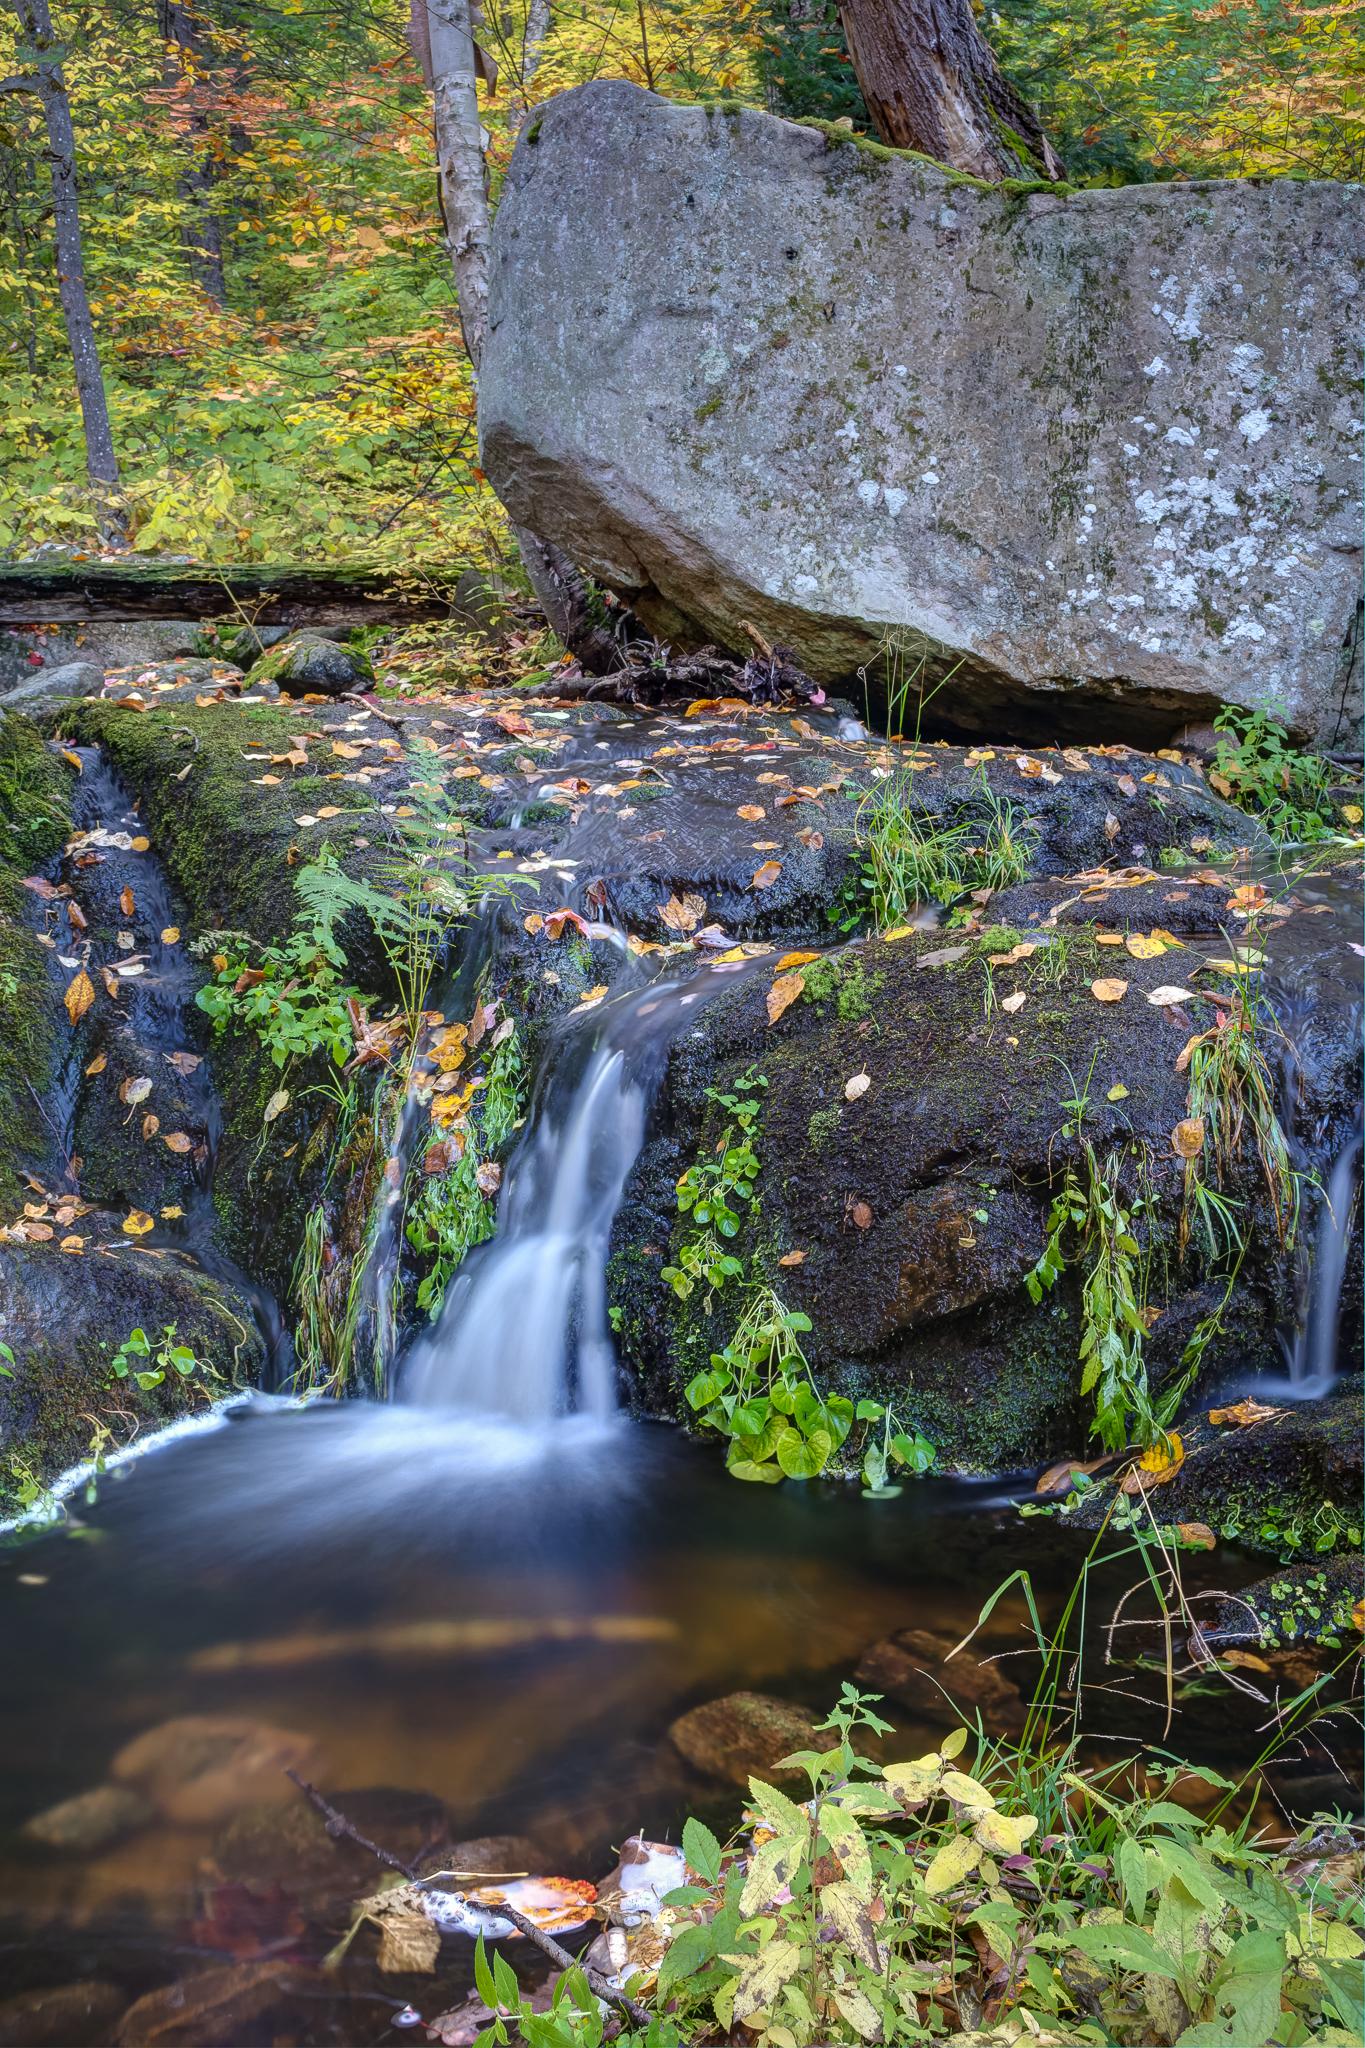 Waterfall on Centennial Ridges Trail (6s, f/13, ISO100)